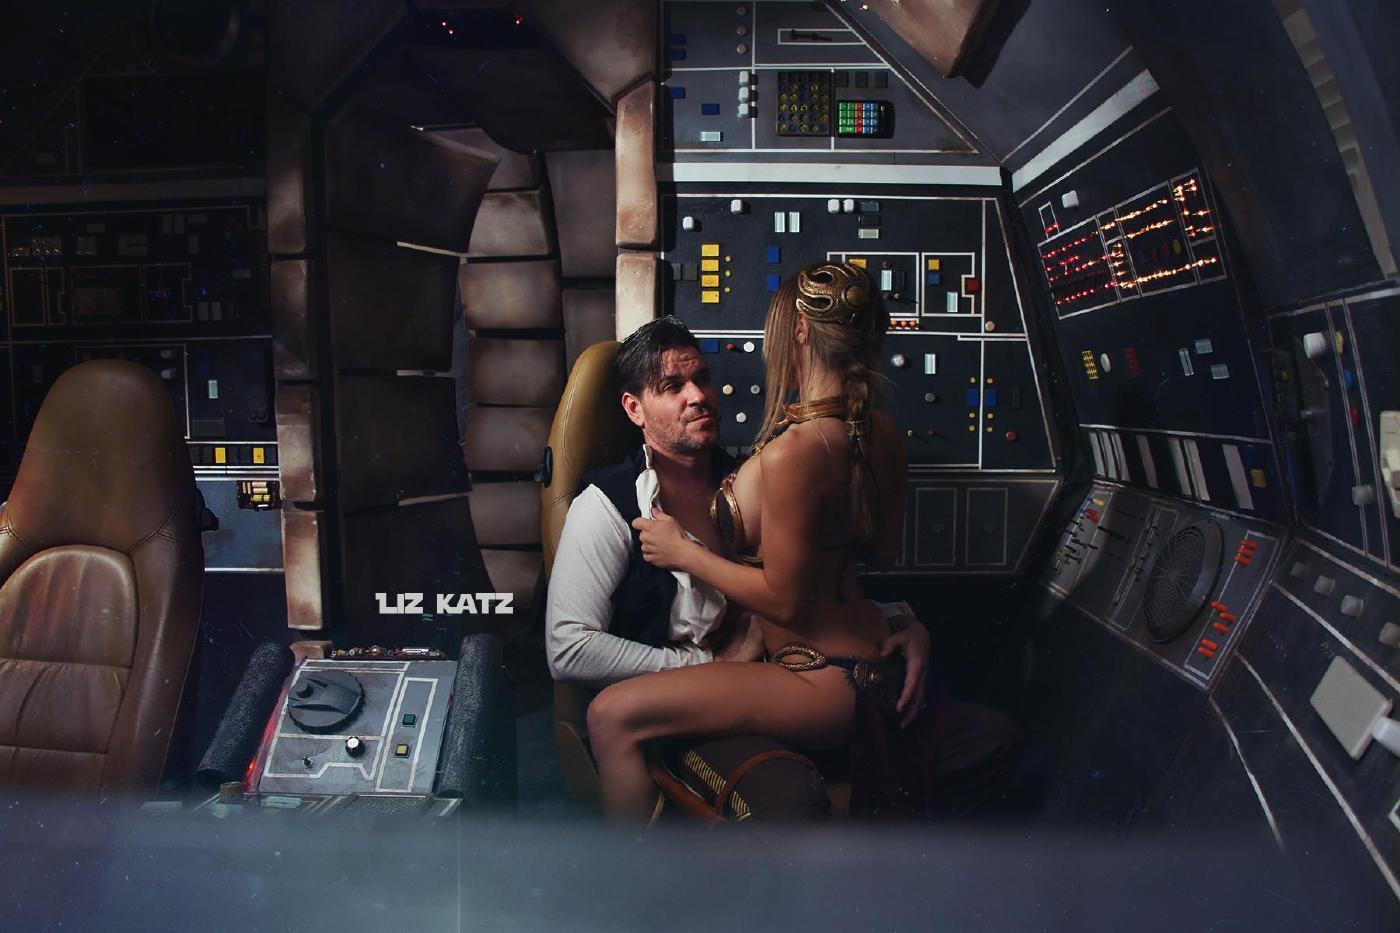 Liz Katz Slave Leia Nude Cosplay Onlyfans Leaked Photos 3